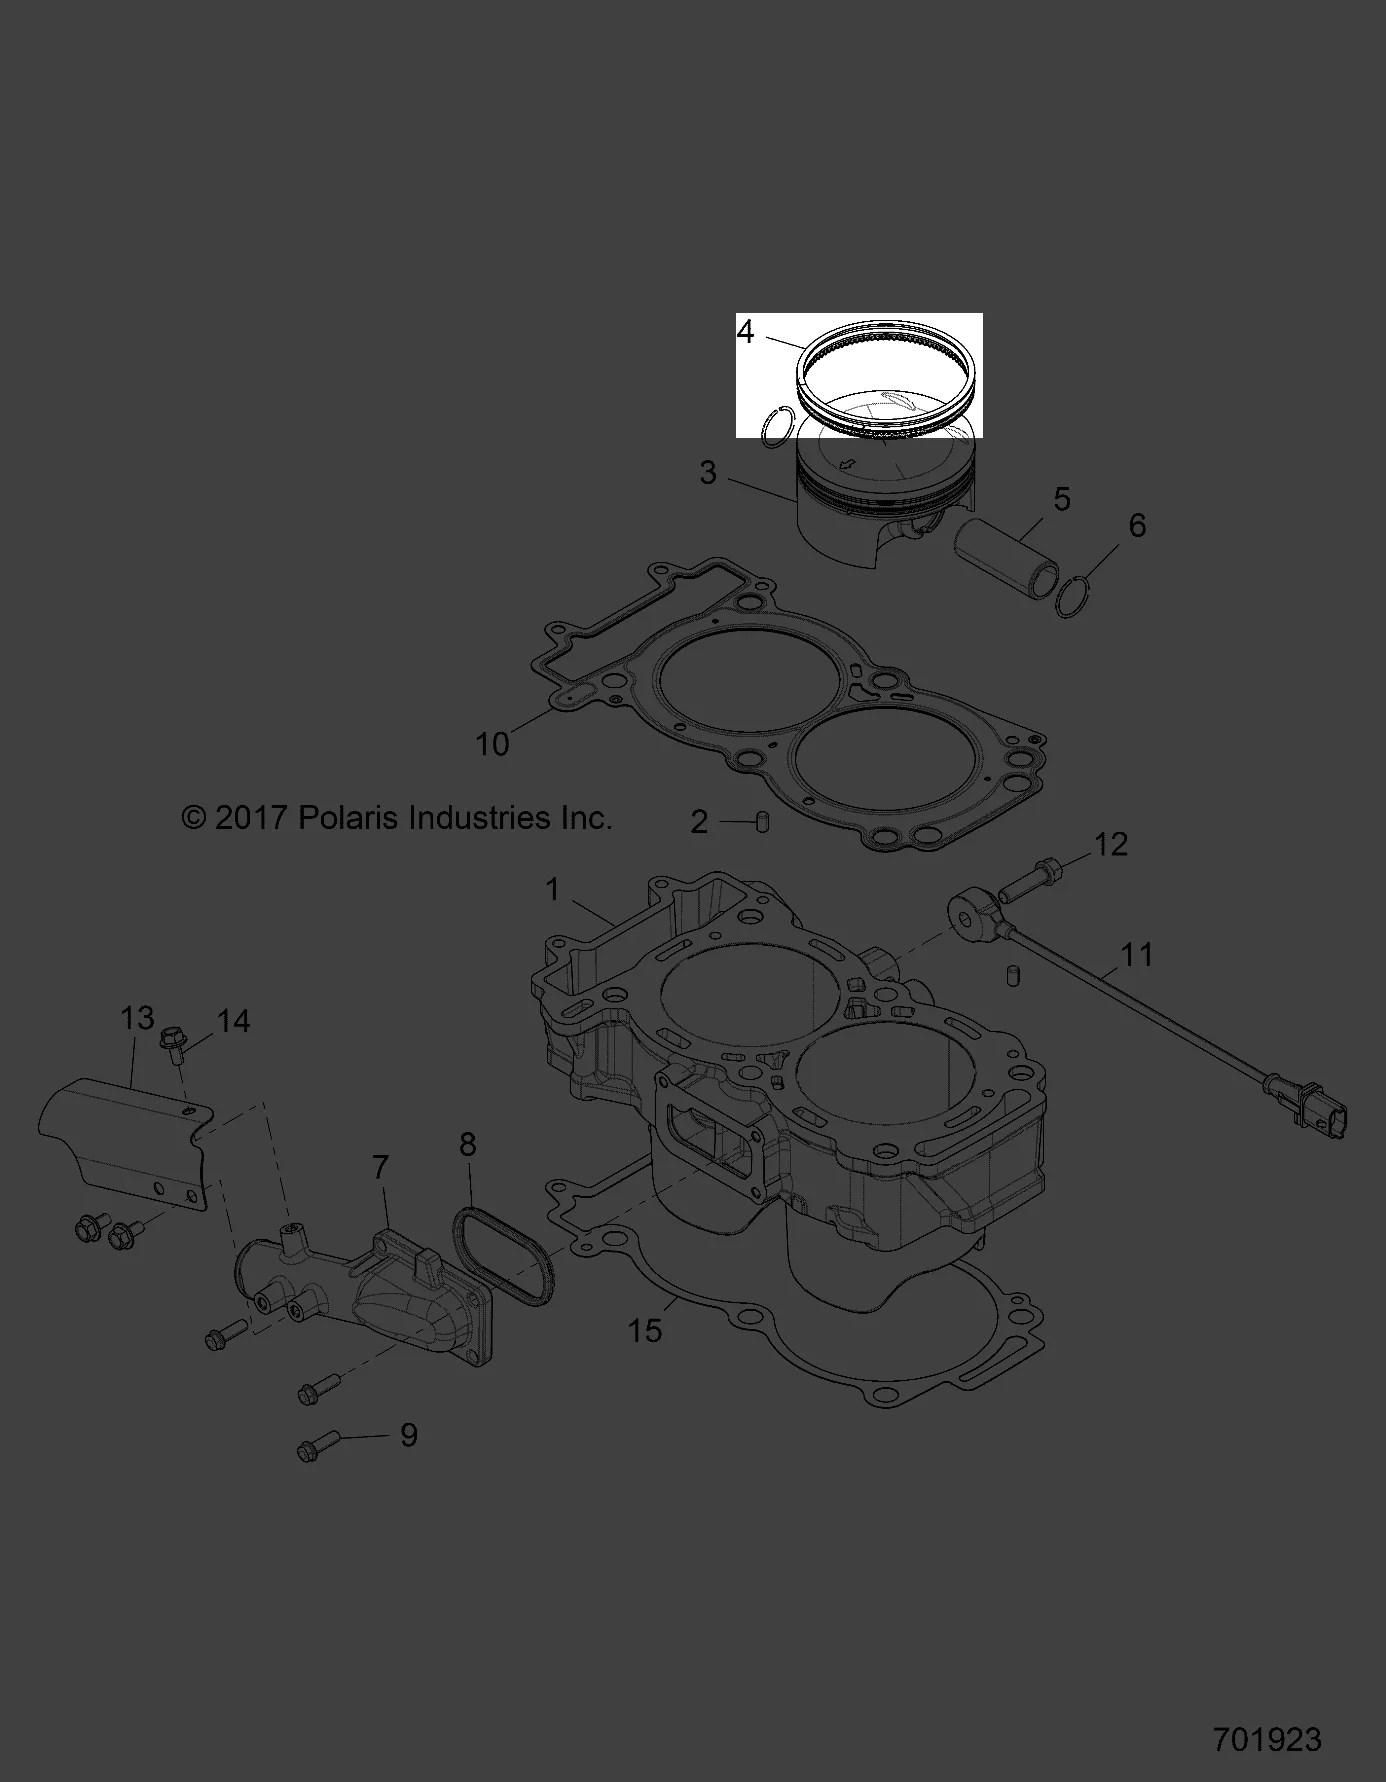 hight resolution of polaris 2016 2018 rzr xp4 turbo md rzr xp4 turbo intl k piston rings 2206217 new oem walmart com